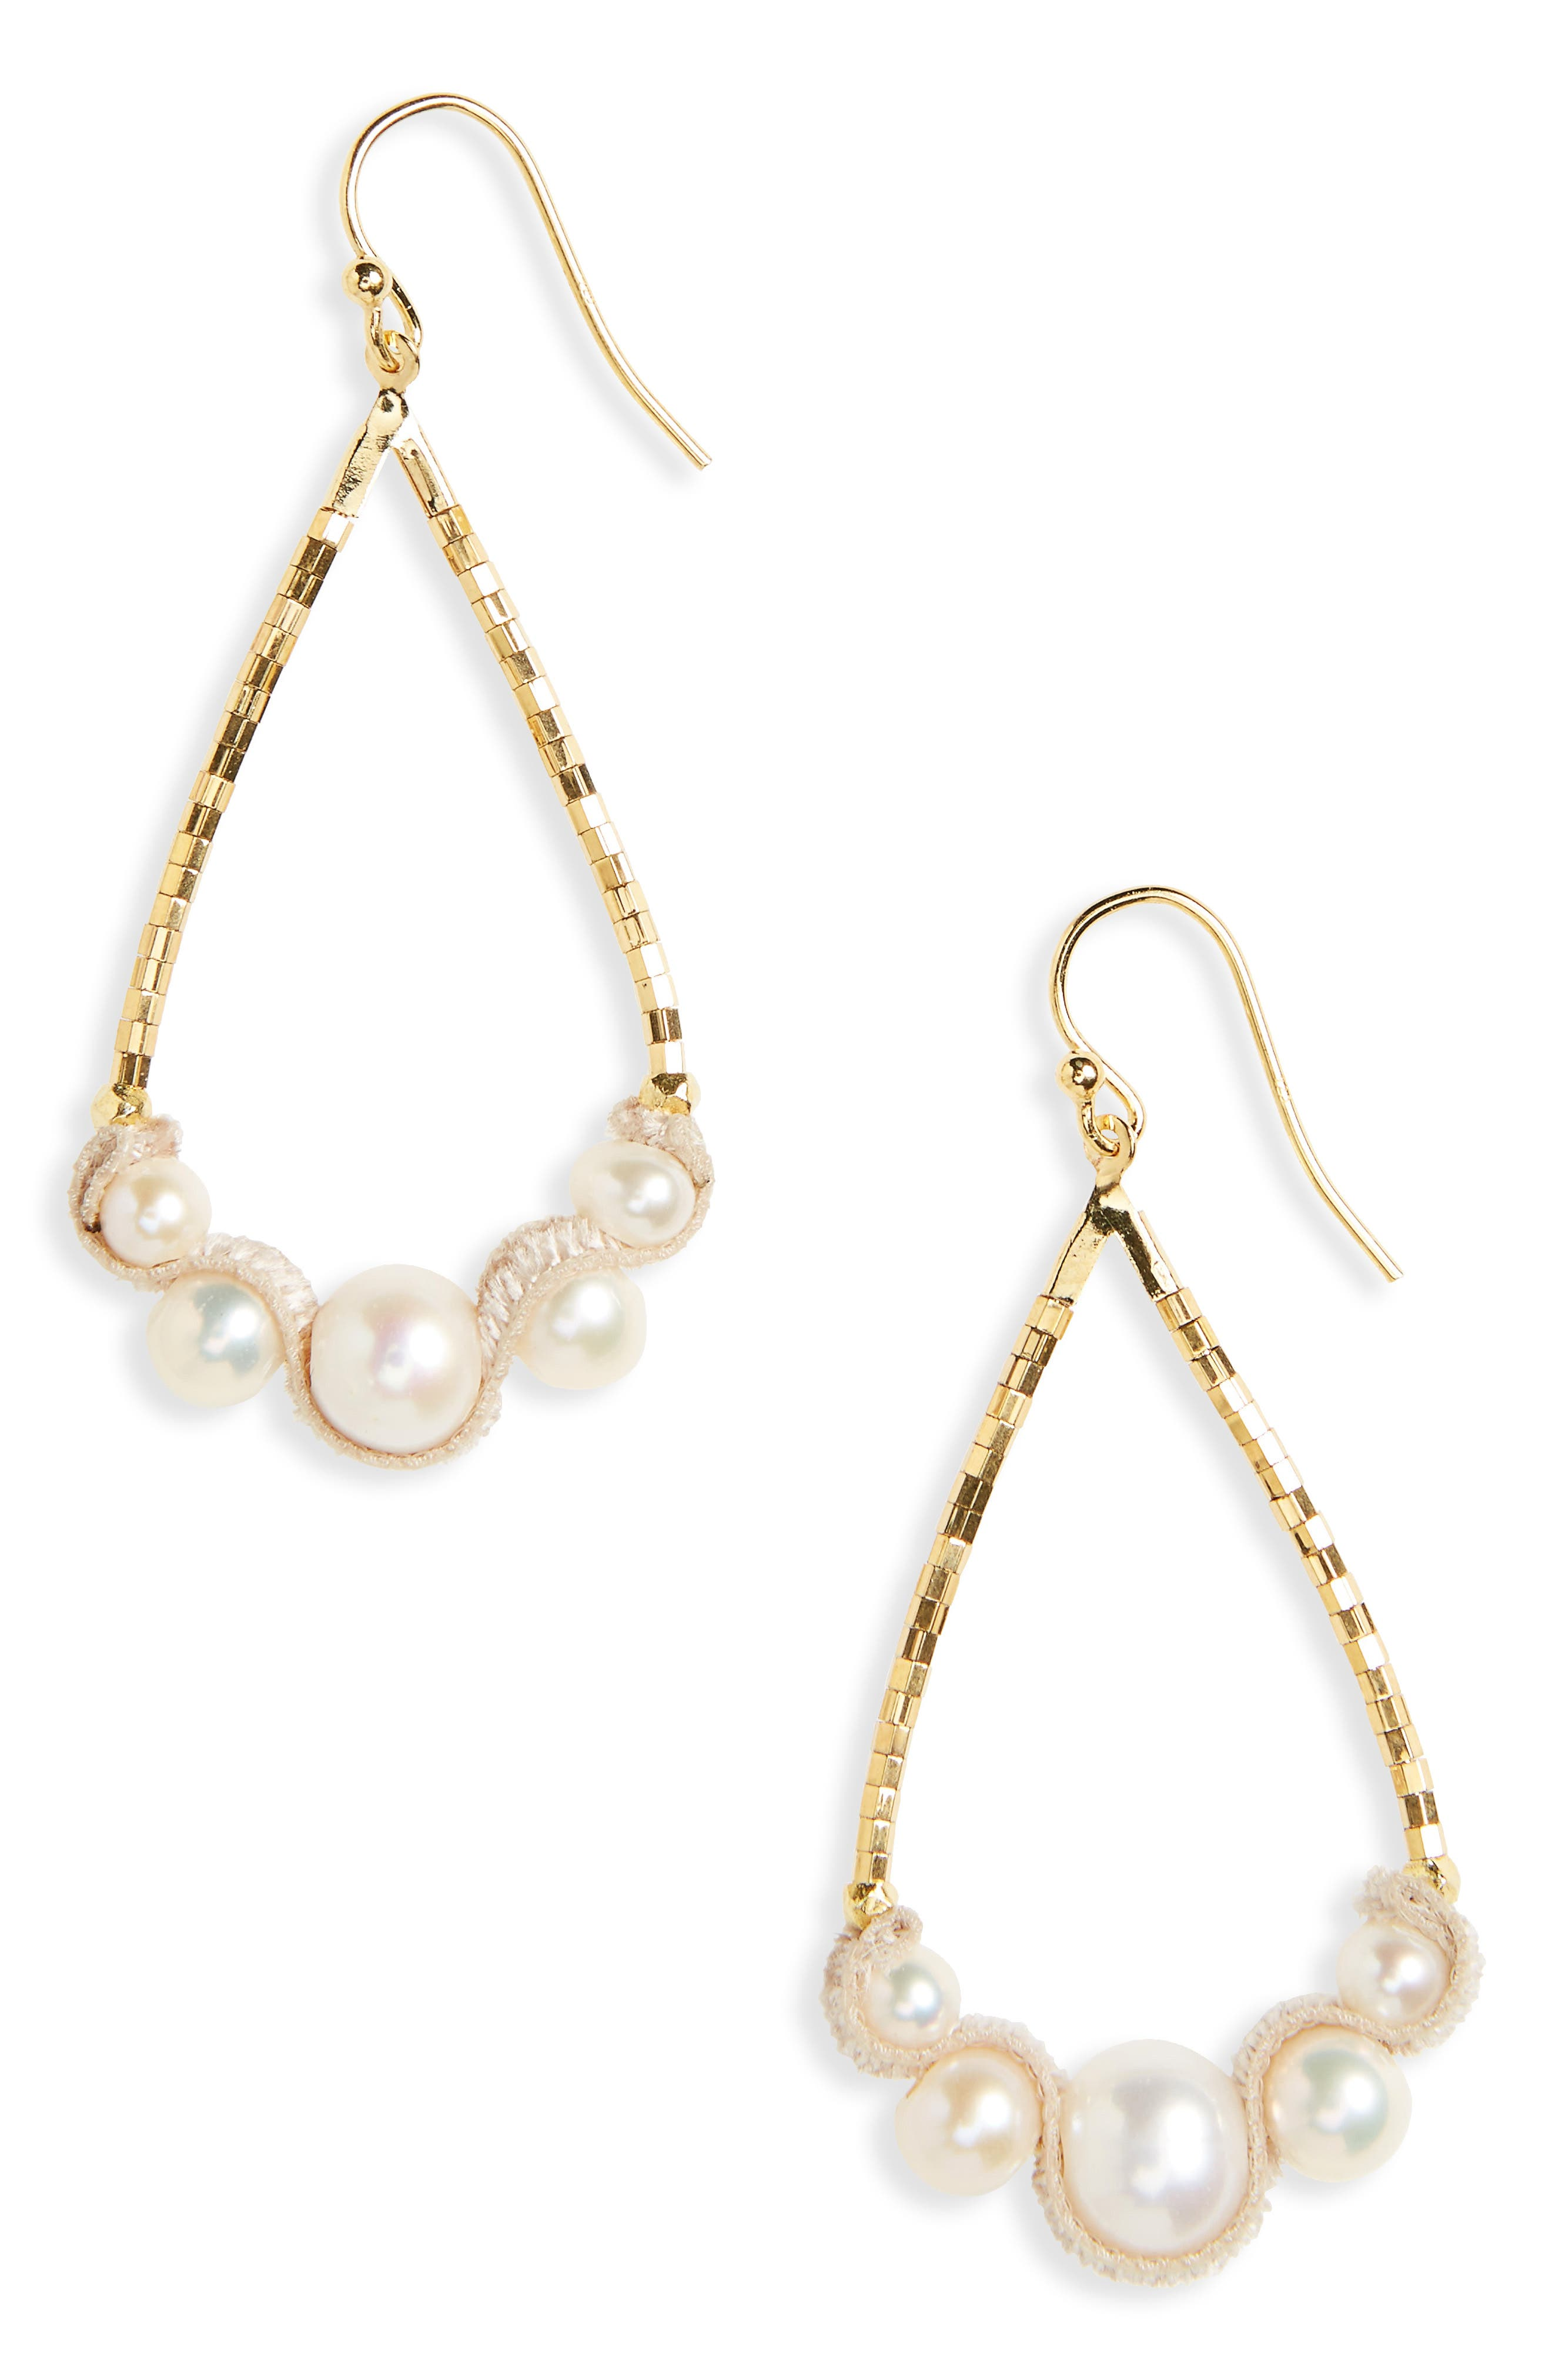 Pearl & Velvet Drop Earrings,                             Main thumbnail 1, color,                             White Pearl